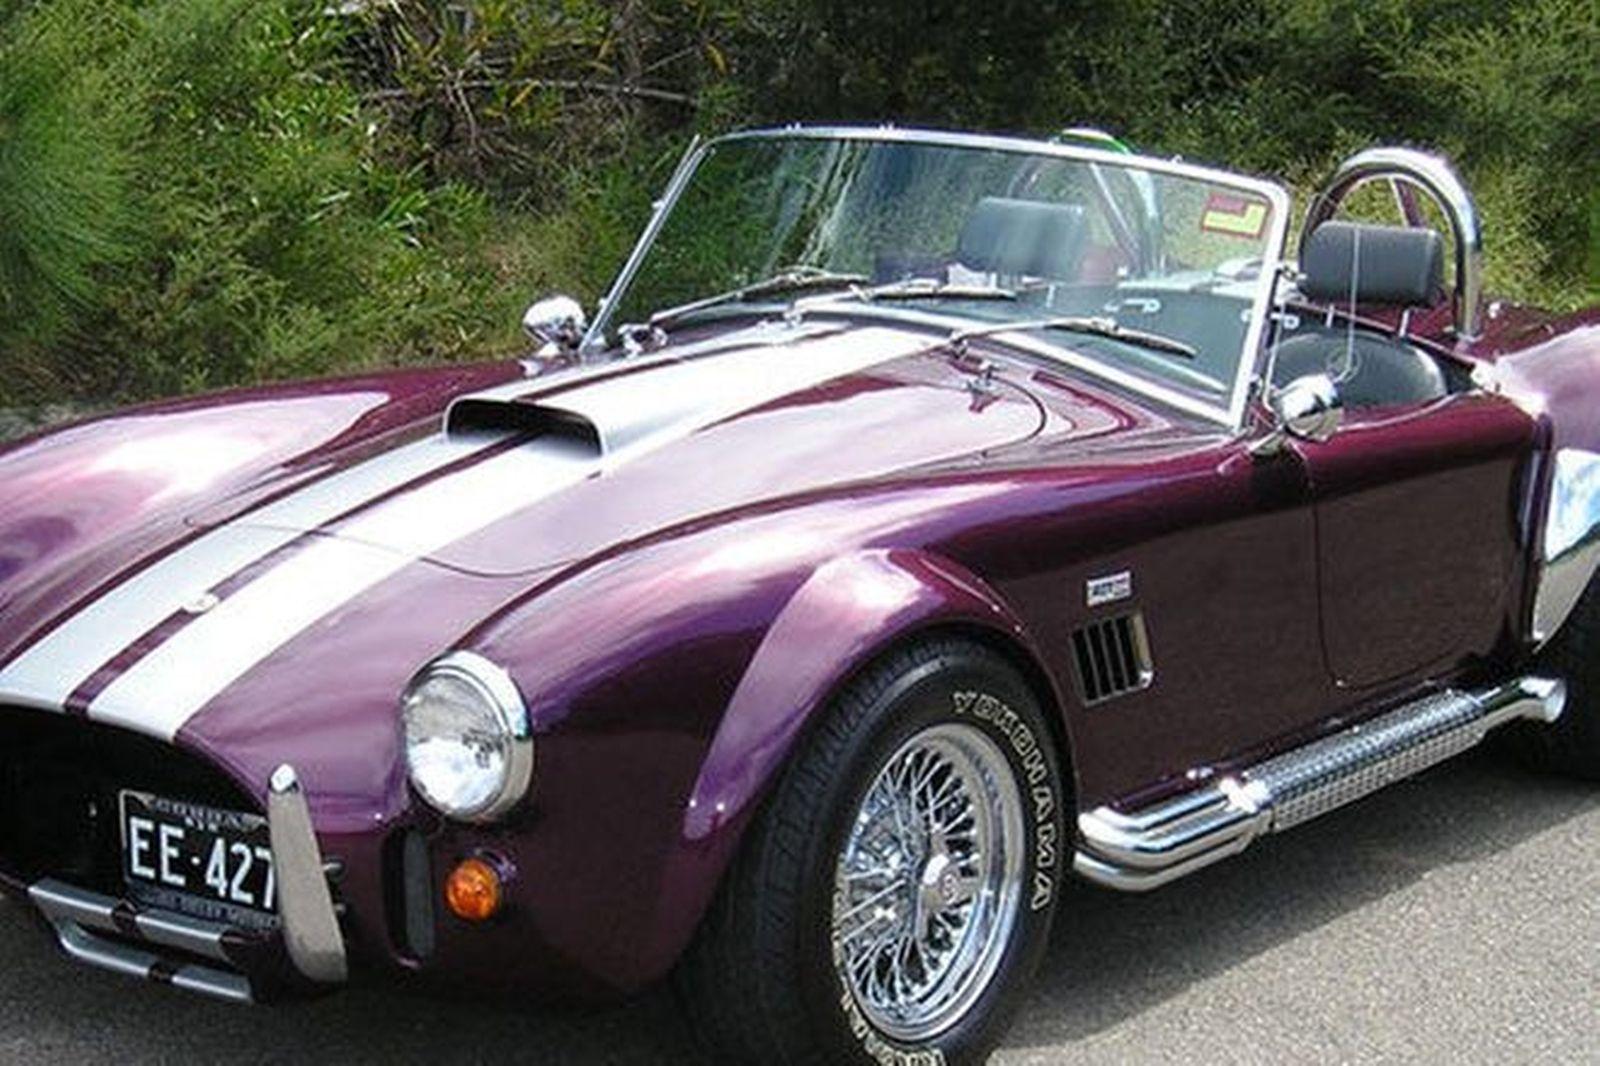 Drb Cobra Replica Roadster Auctions - Lot 8